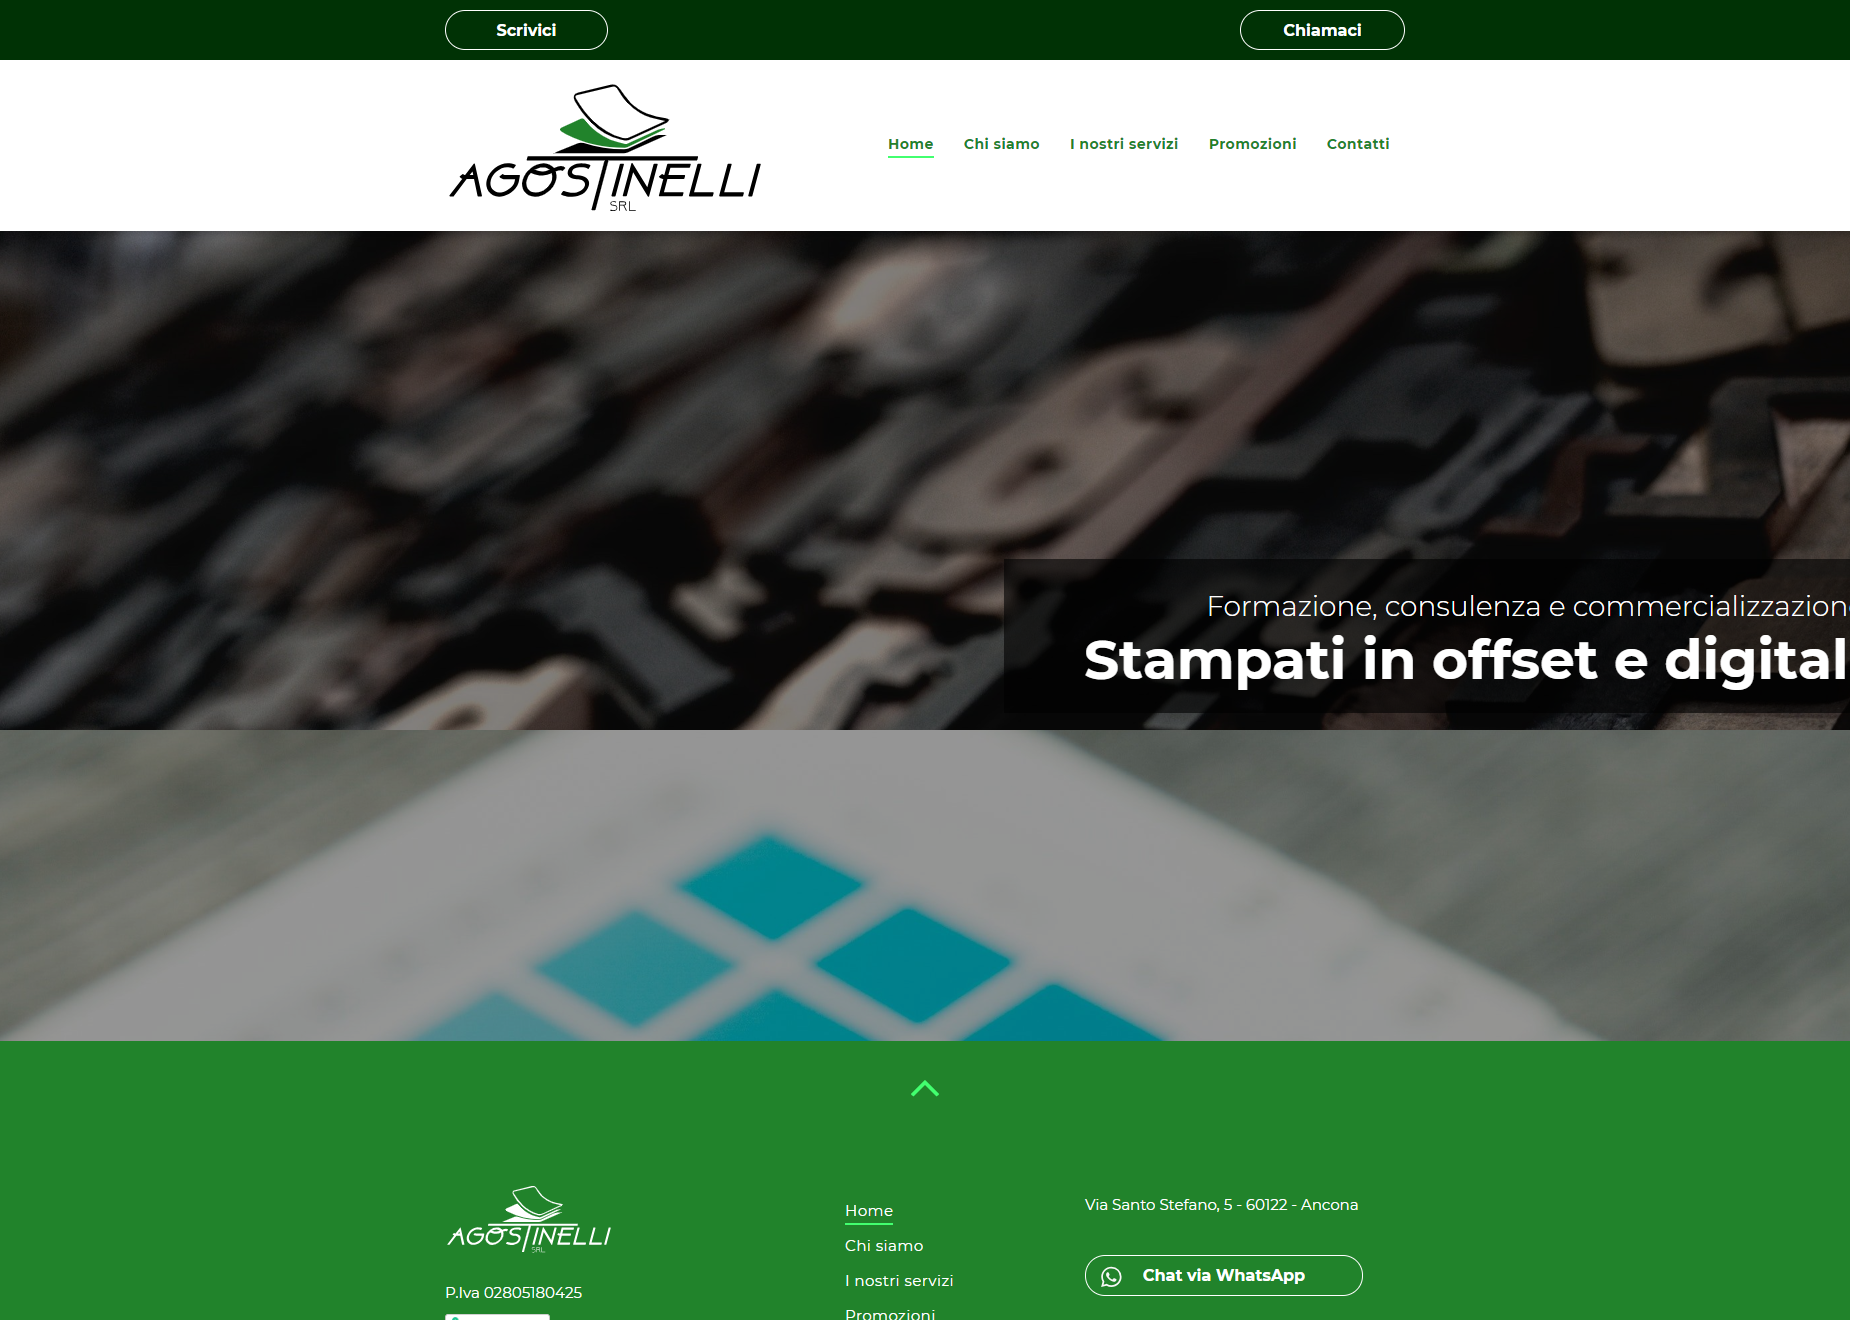 screencapture-agostinelli-info-2019-02-22-11_47_37 (1)